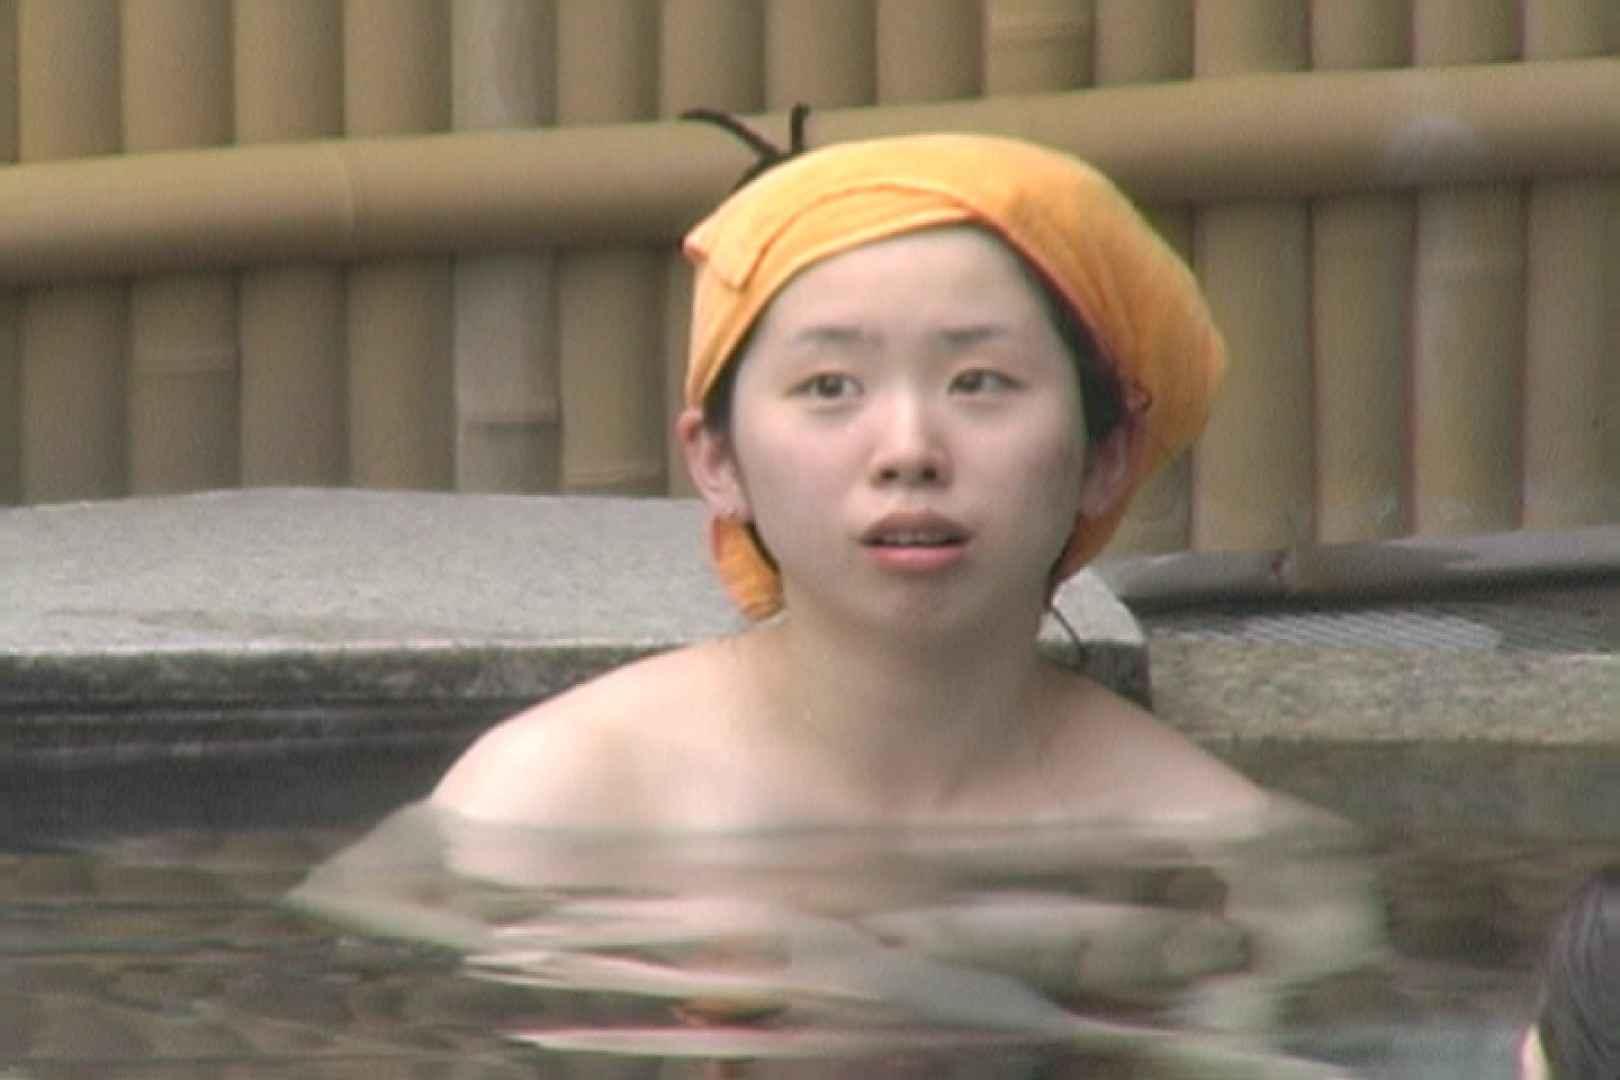 Aquaな露天風呂Vol.641 HなOL | 露天  50pic 17